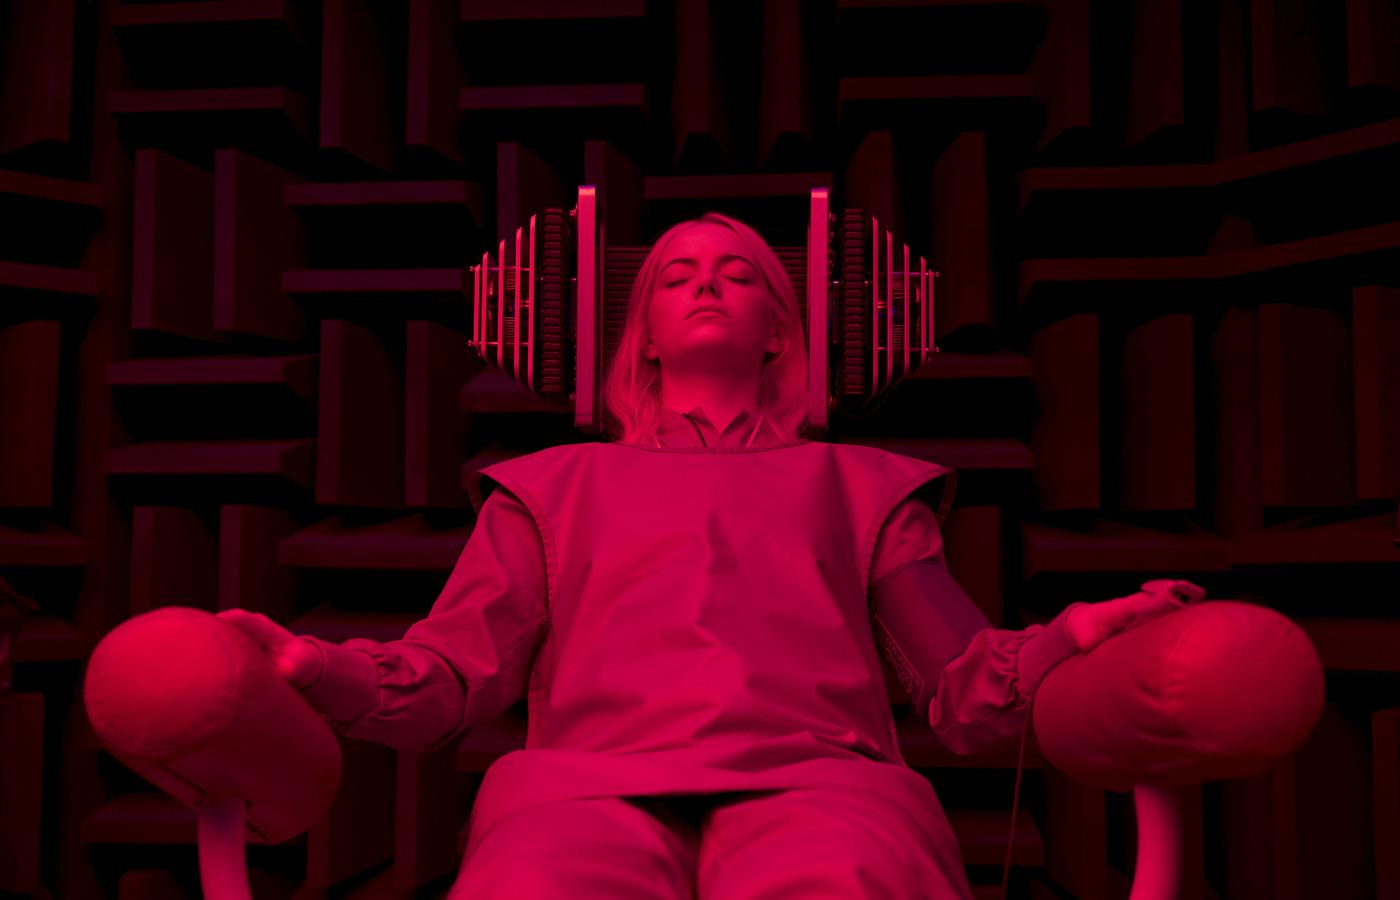 maniac-2018-tv-show-emma-stone-julia-garner-5k-9j.jpg